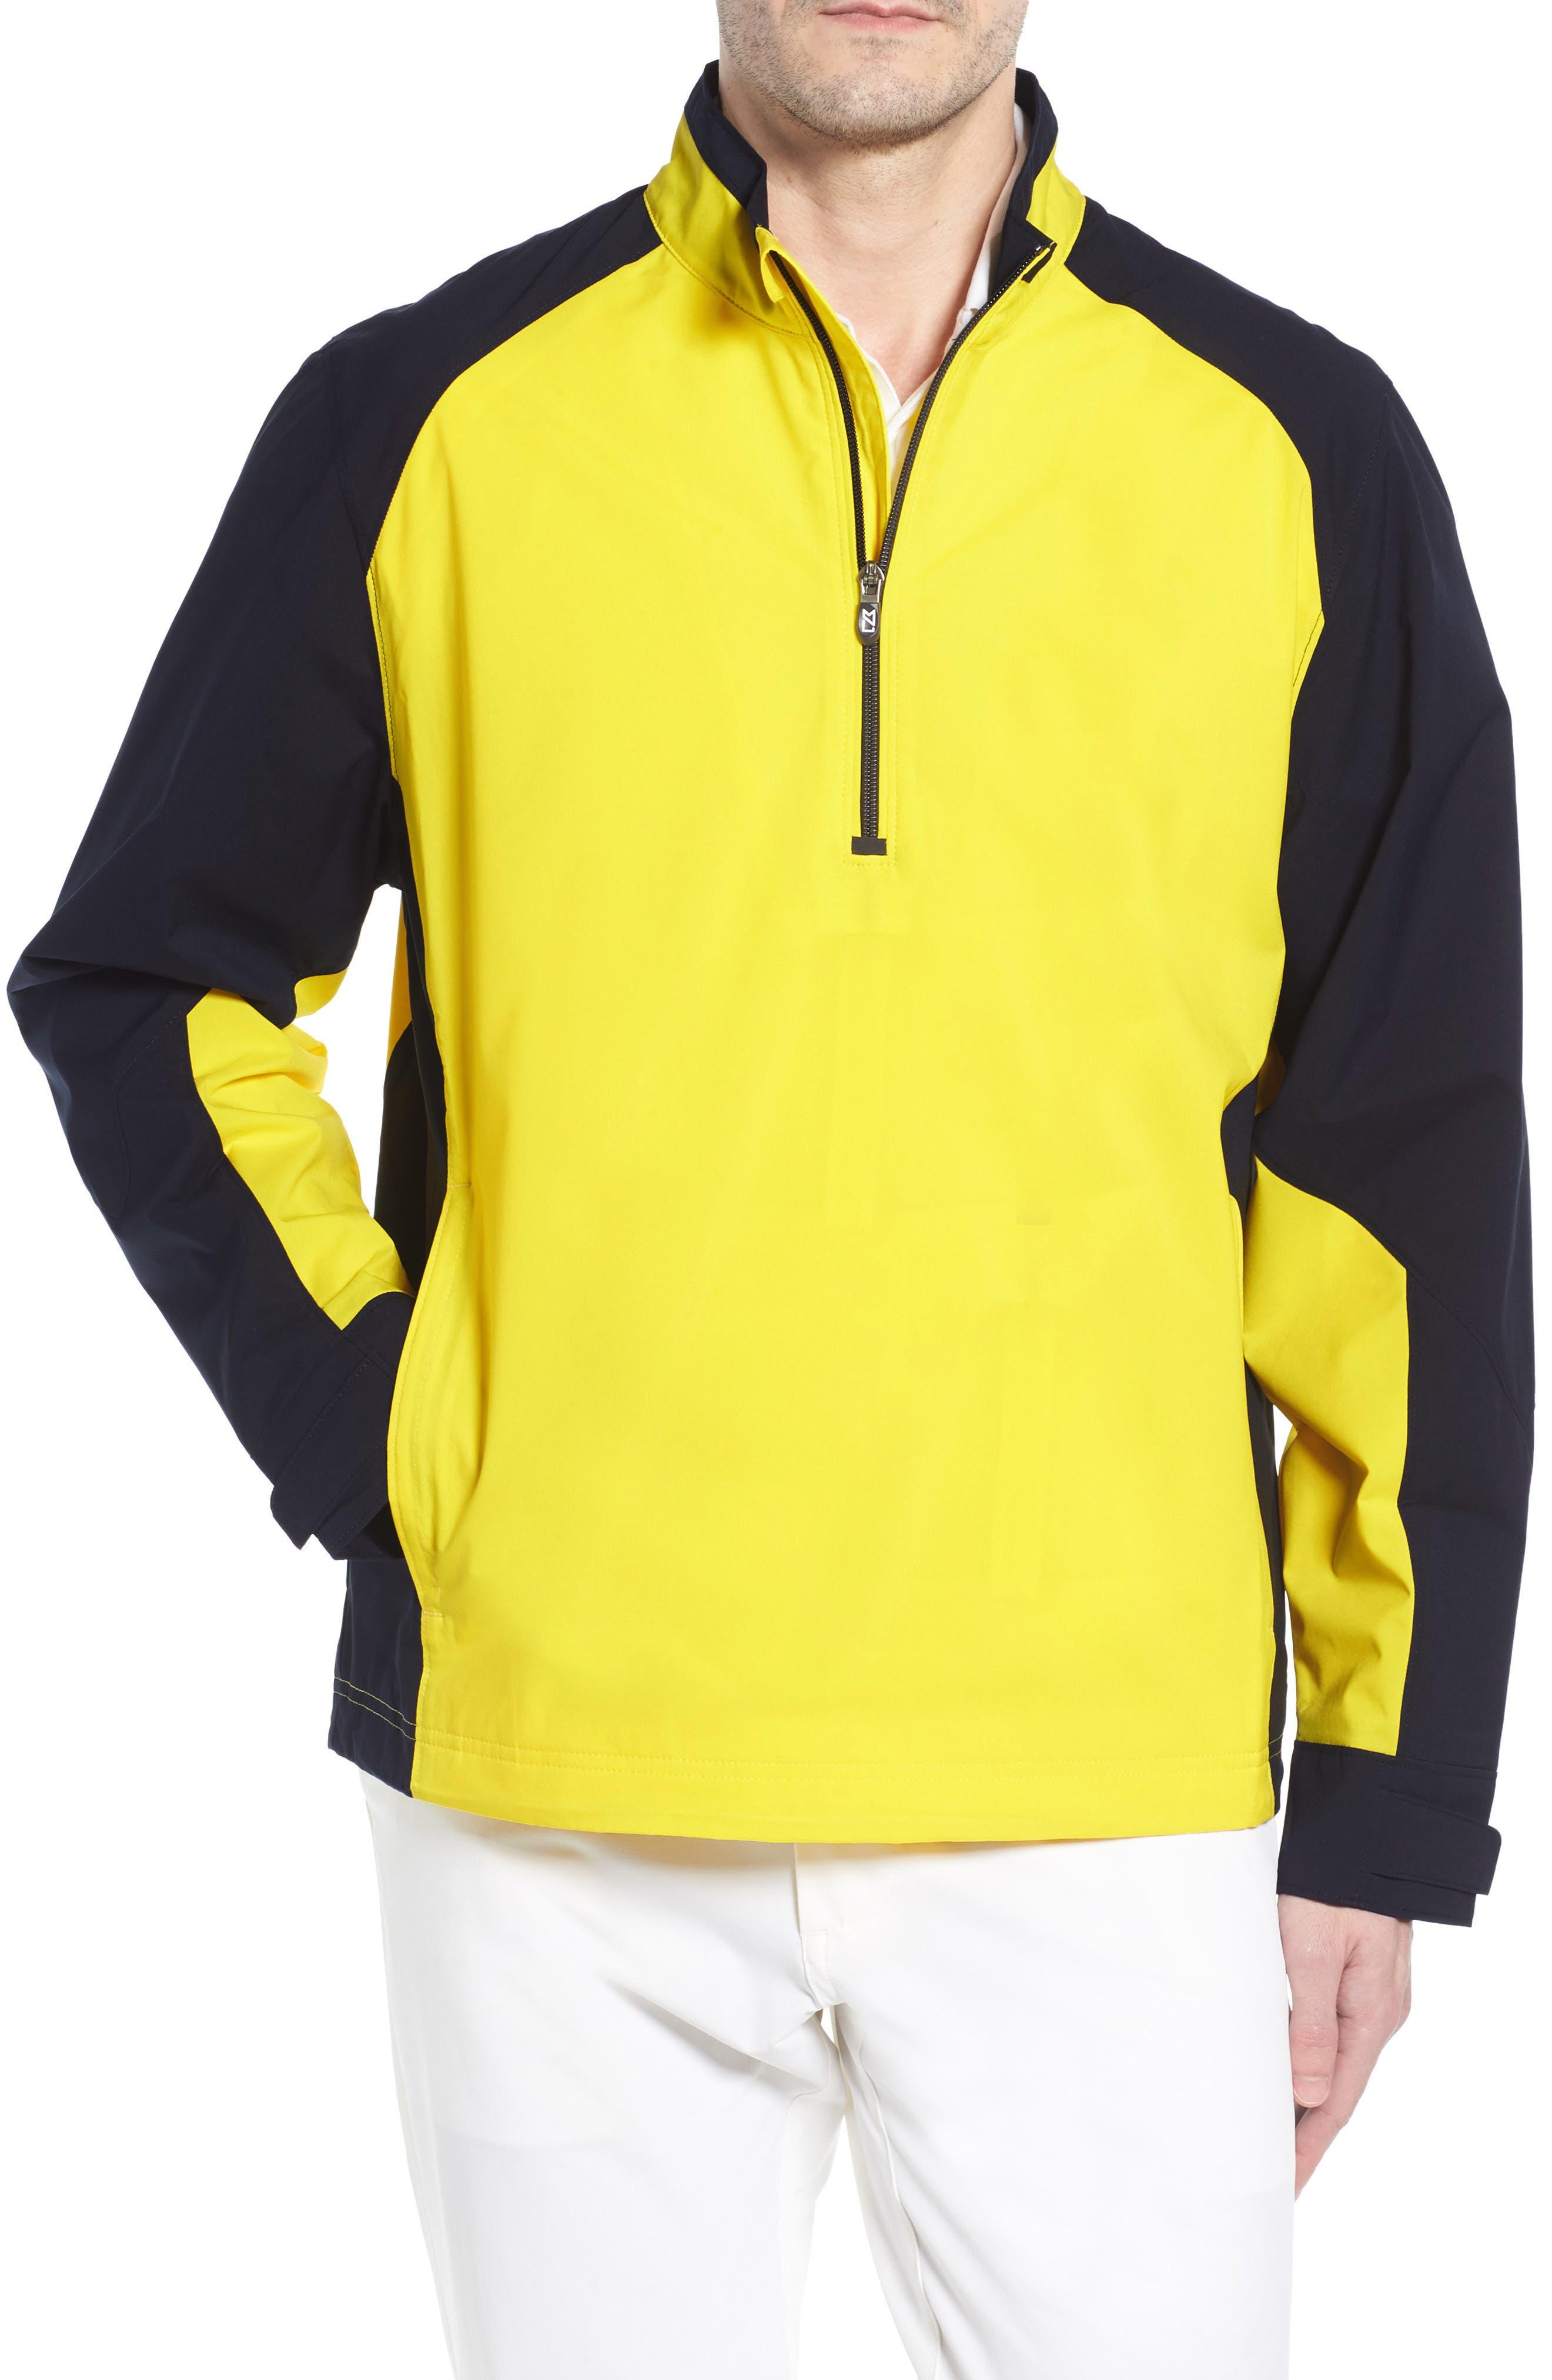 'Summit' WeatherTec Wind & Water Resistant Half Zip Jacket,                             Main thumbnail 1, color,                             GALAXY